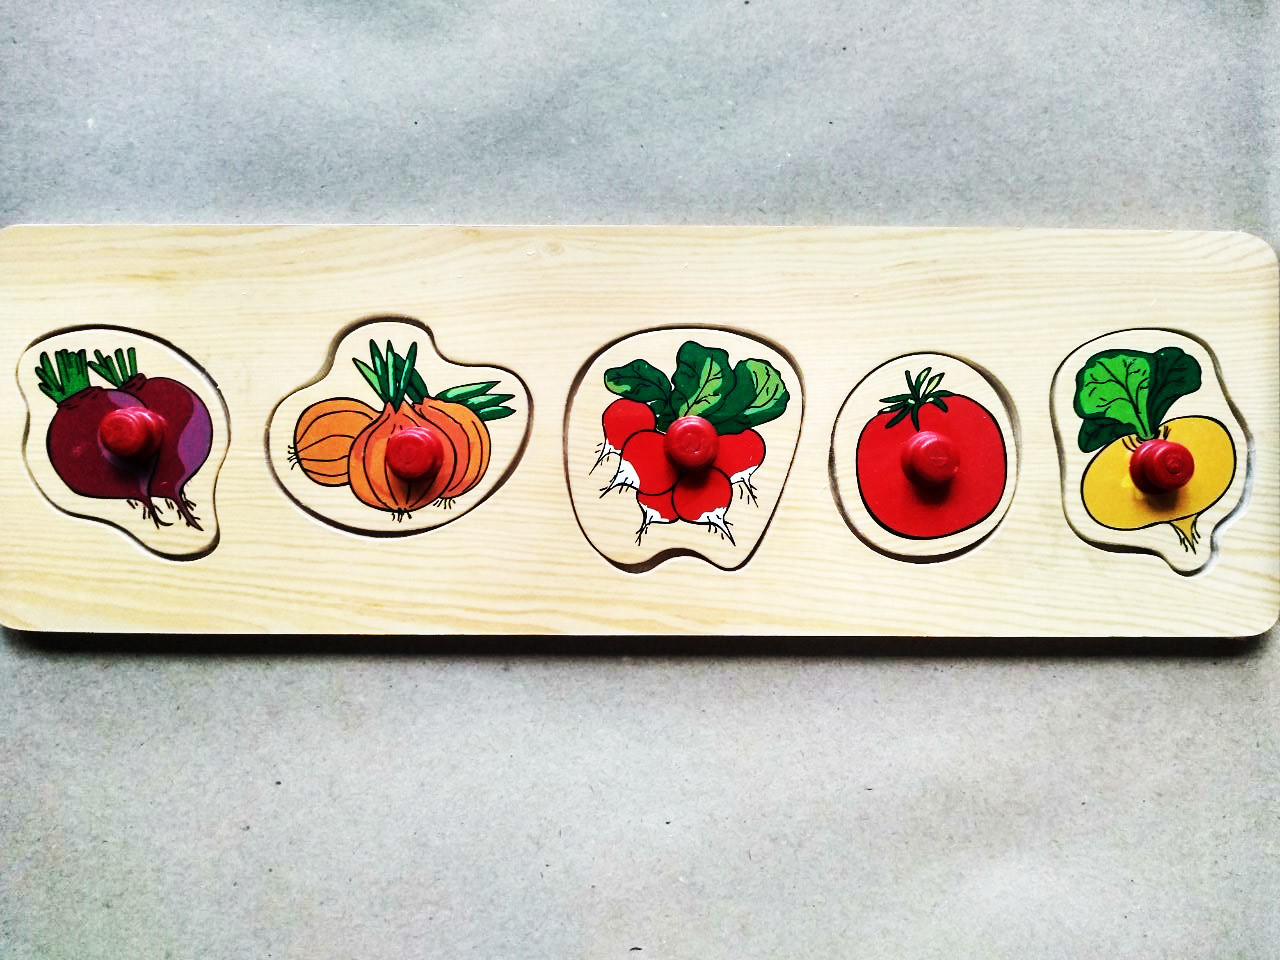 Овощи рамки-вкладыши маленькие.